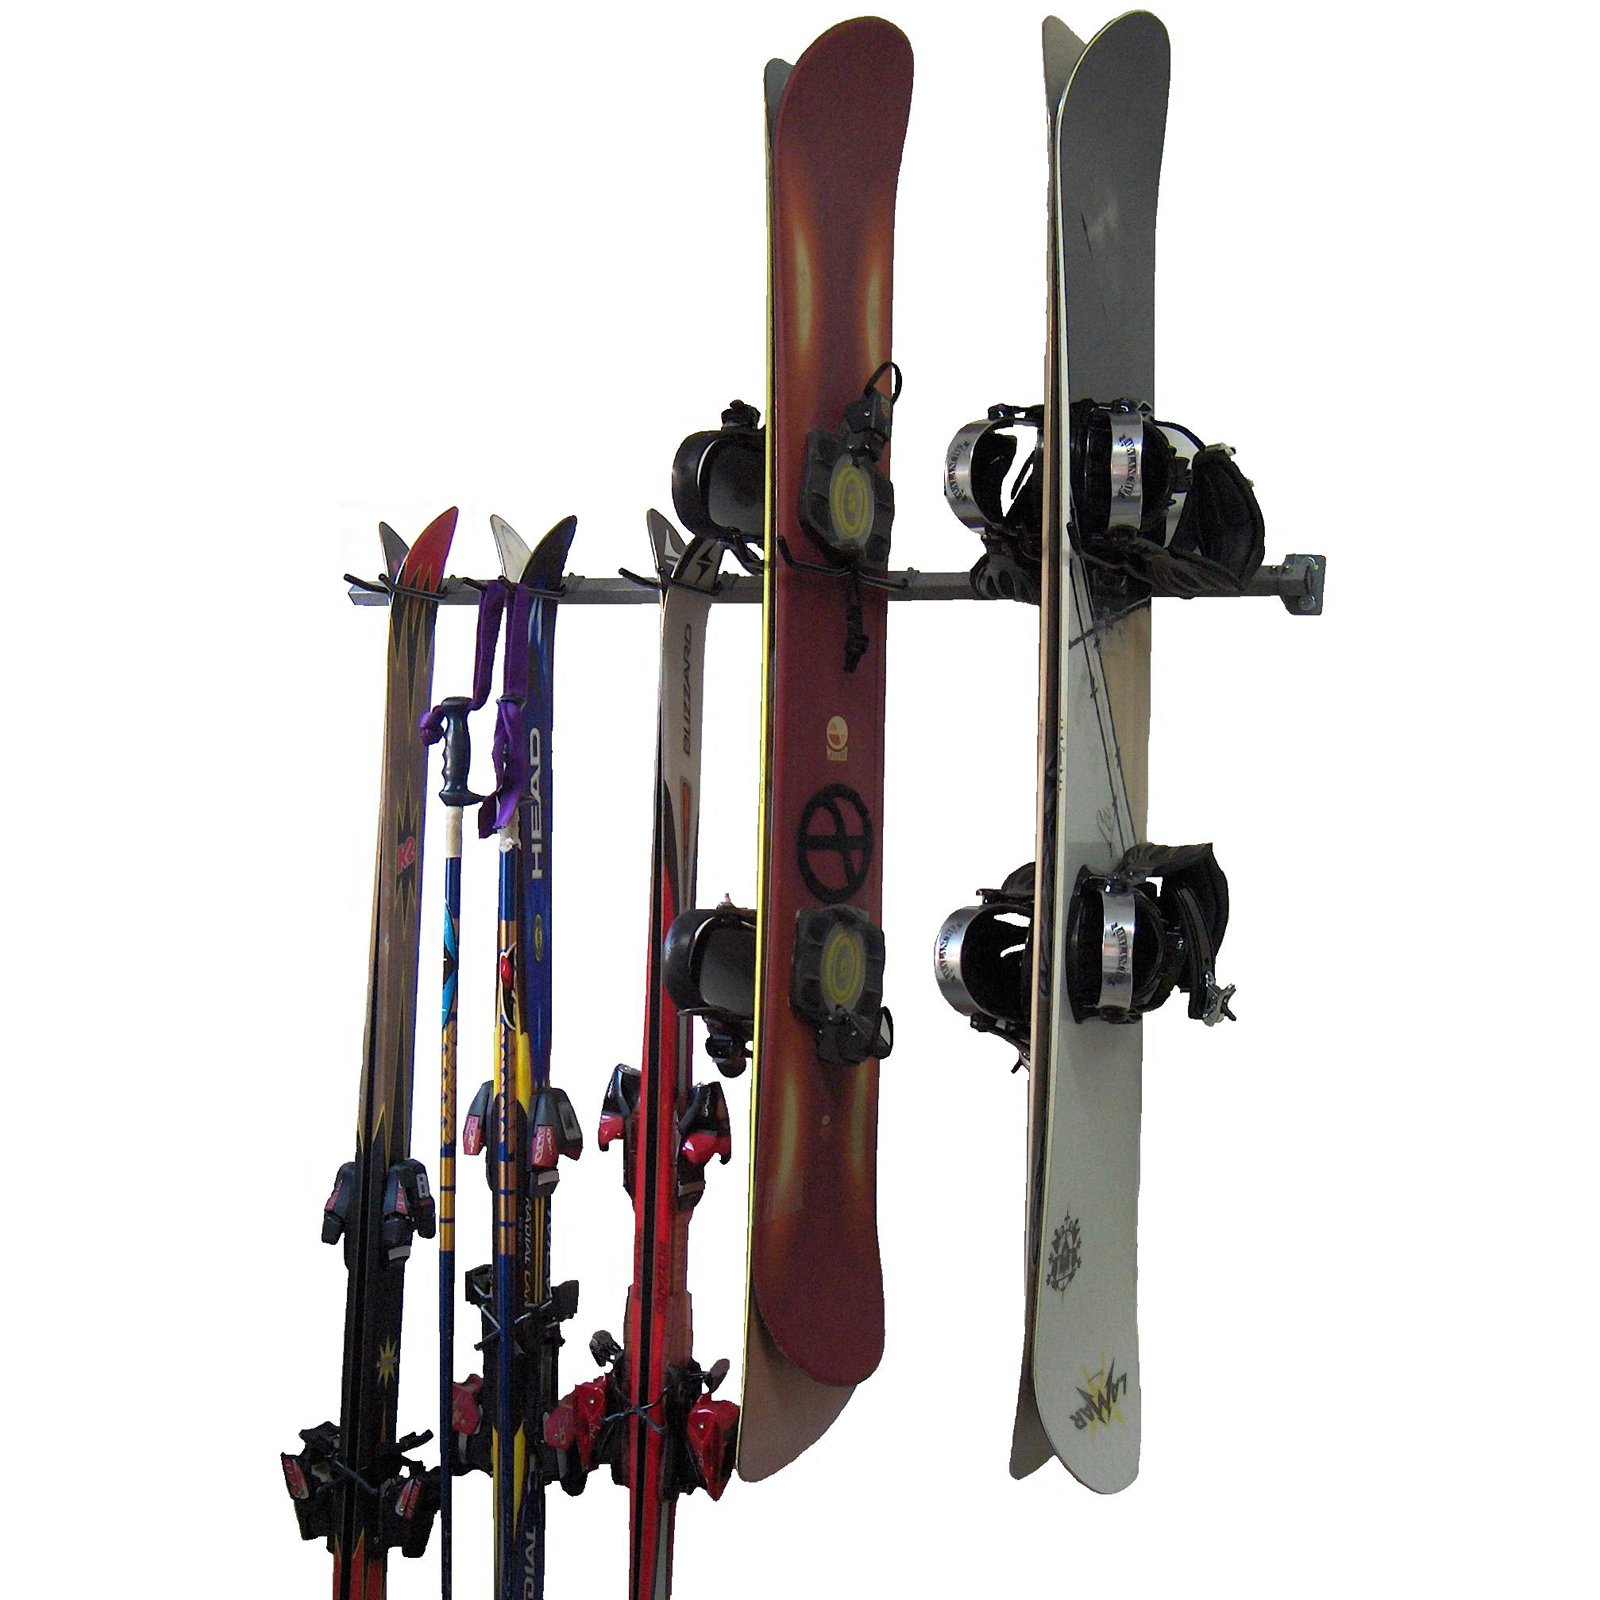 Monkey Bar Storage Ski and Snowboard Rack by Monkey Bars